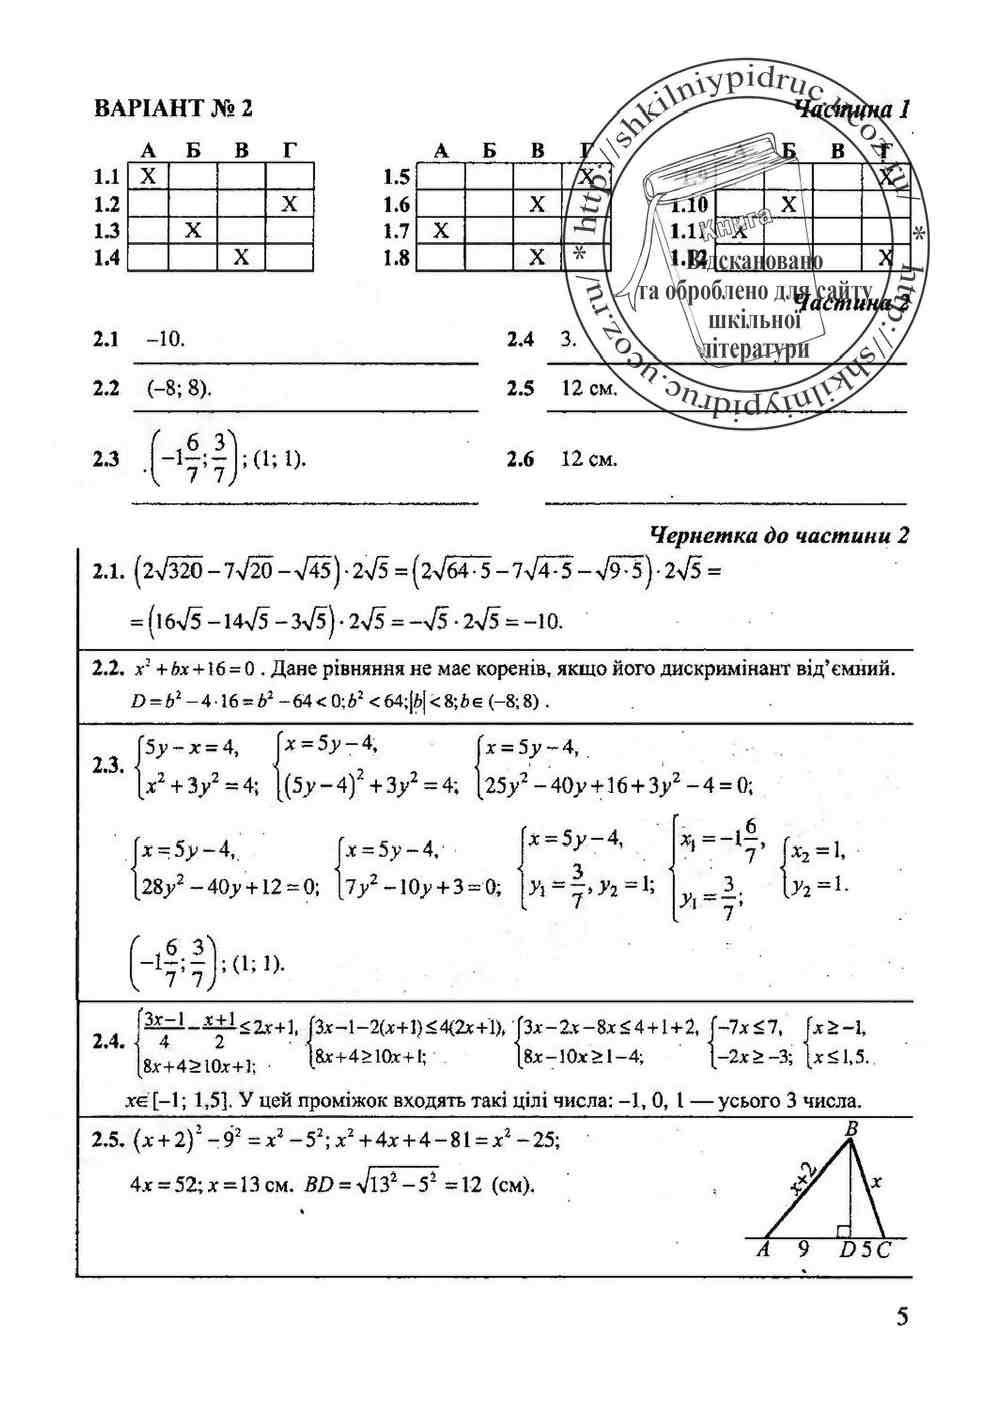 дпа решебник 2014 математика 9 класс